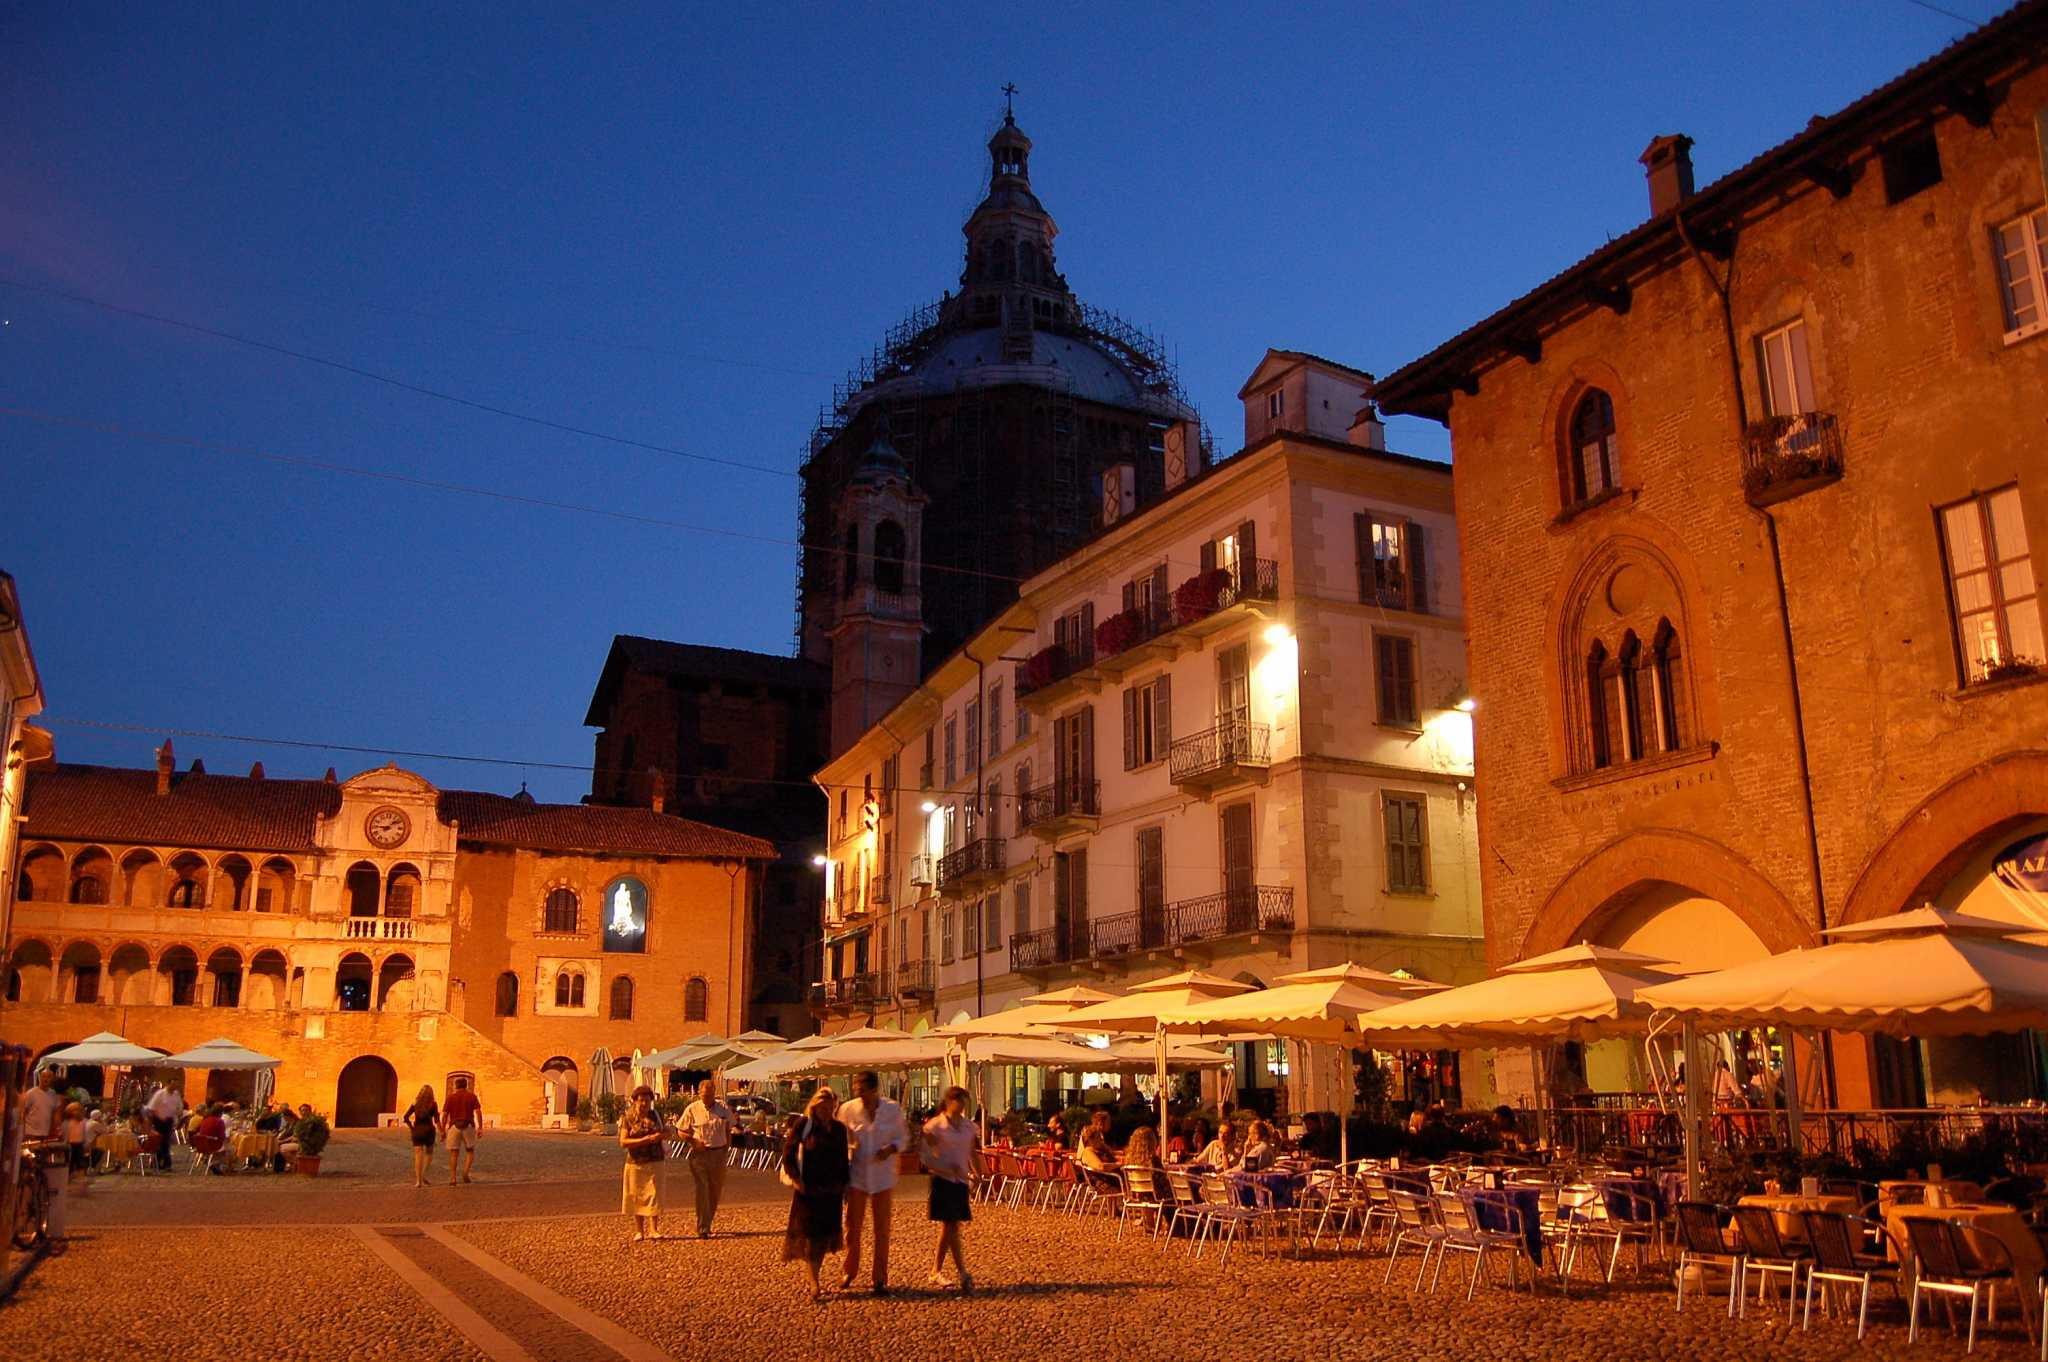 Avvocati Divorzisti di Pavia